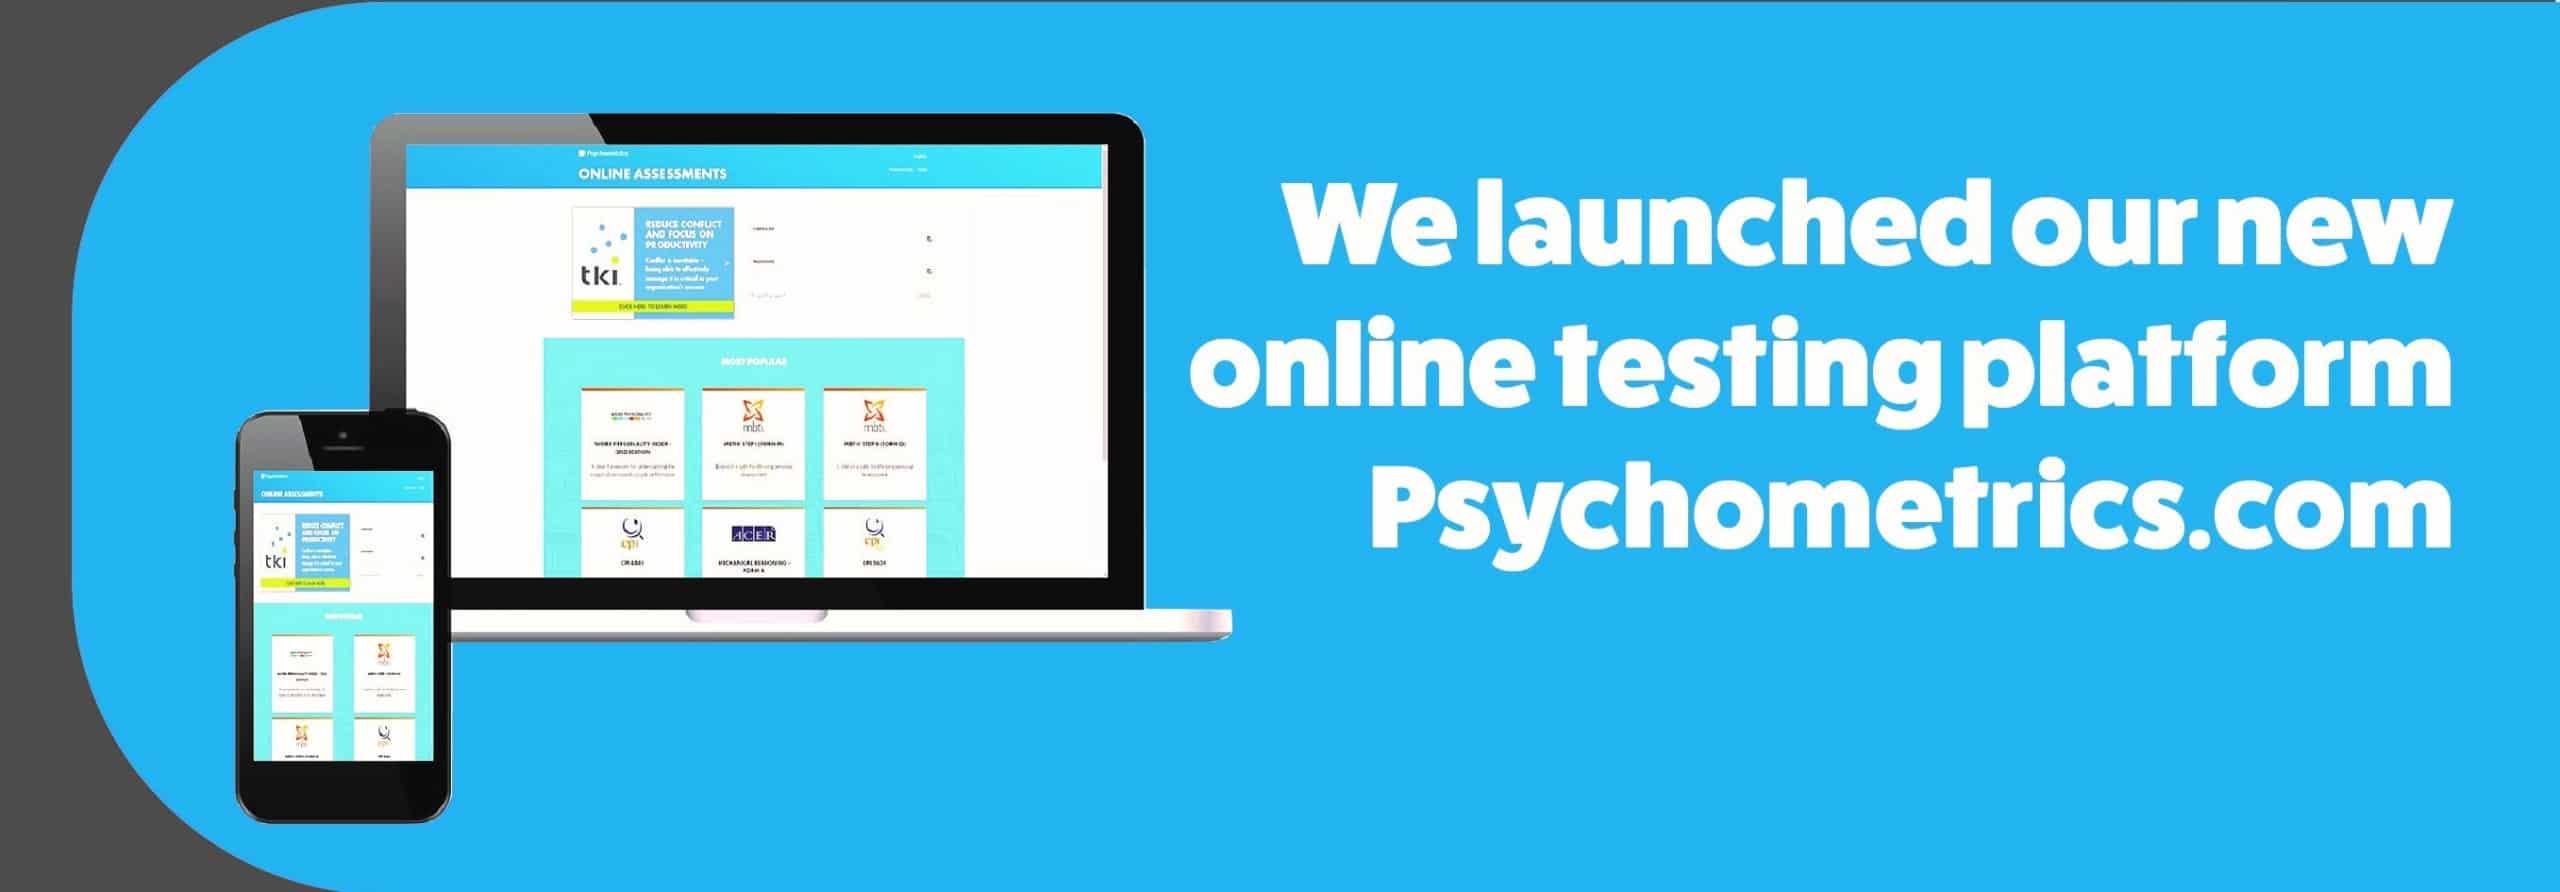 Launched online platform Psychometrics.com